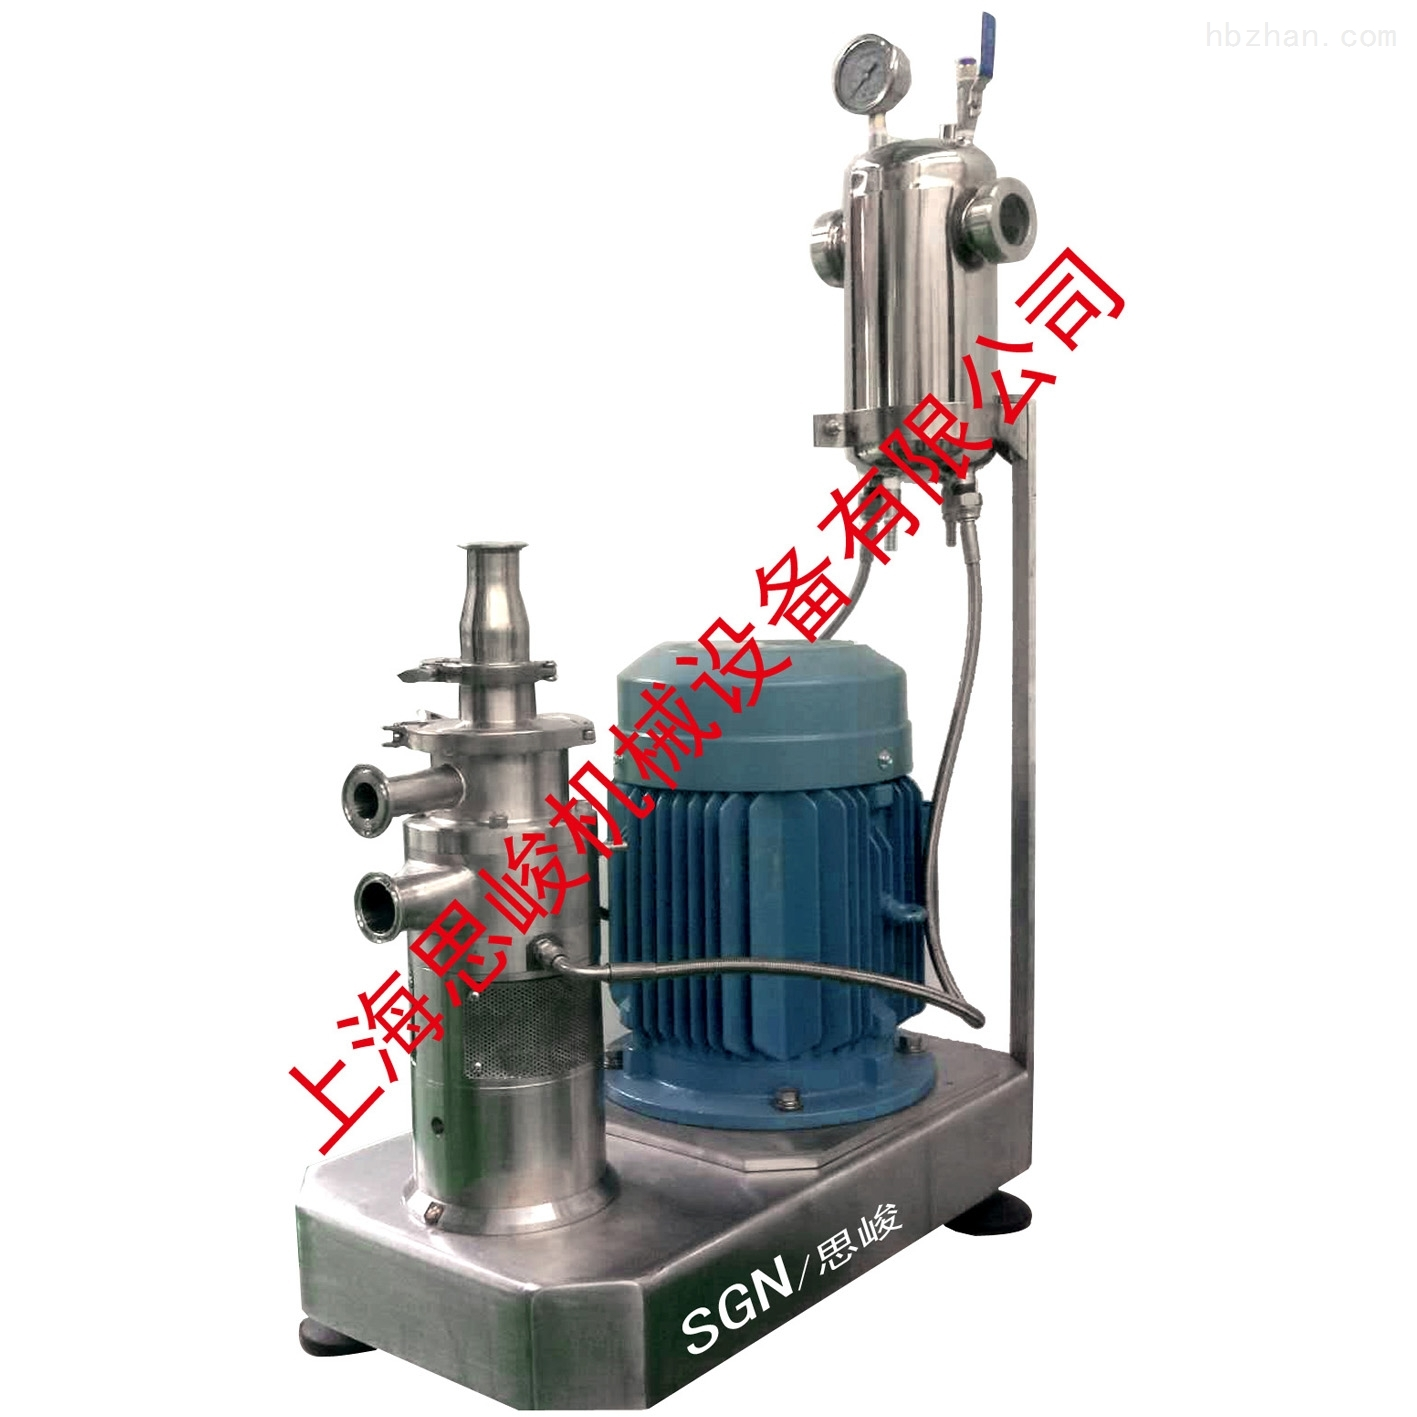 SGN石墨烯超级电容浆料分散机